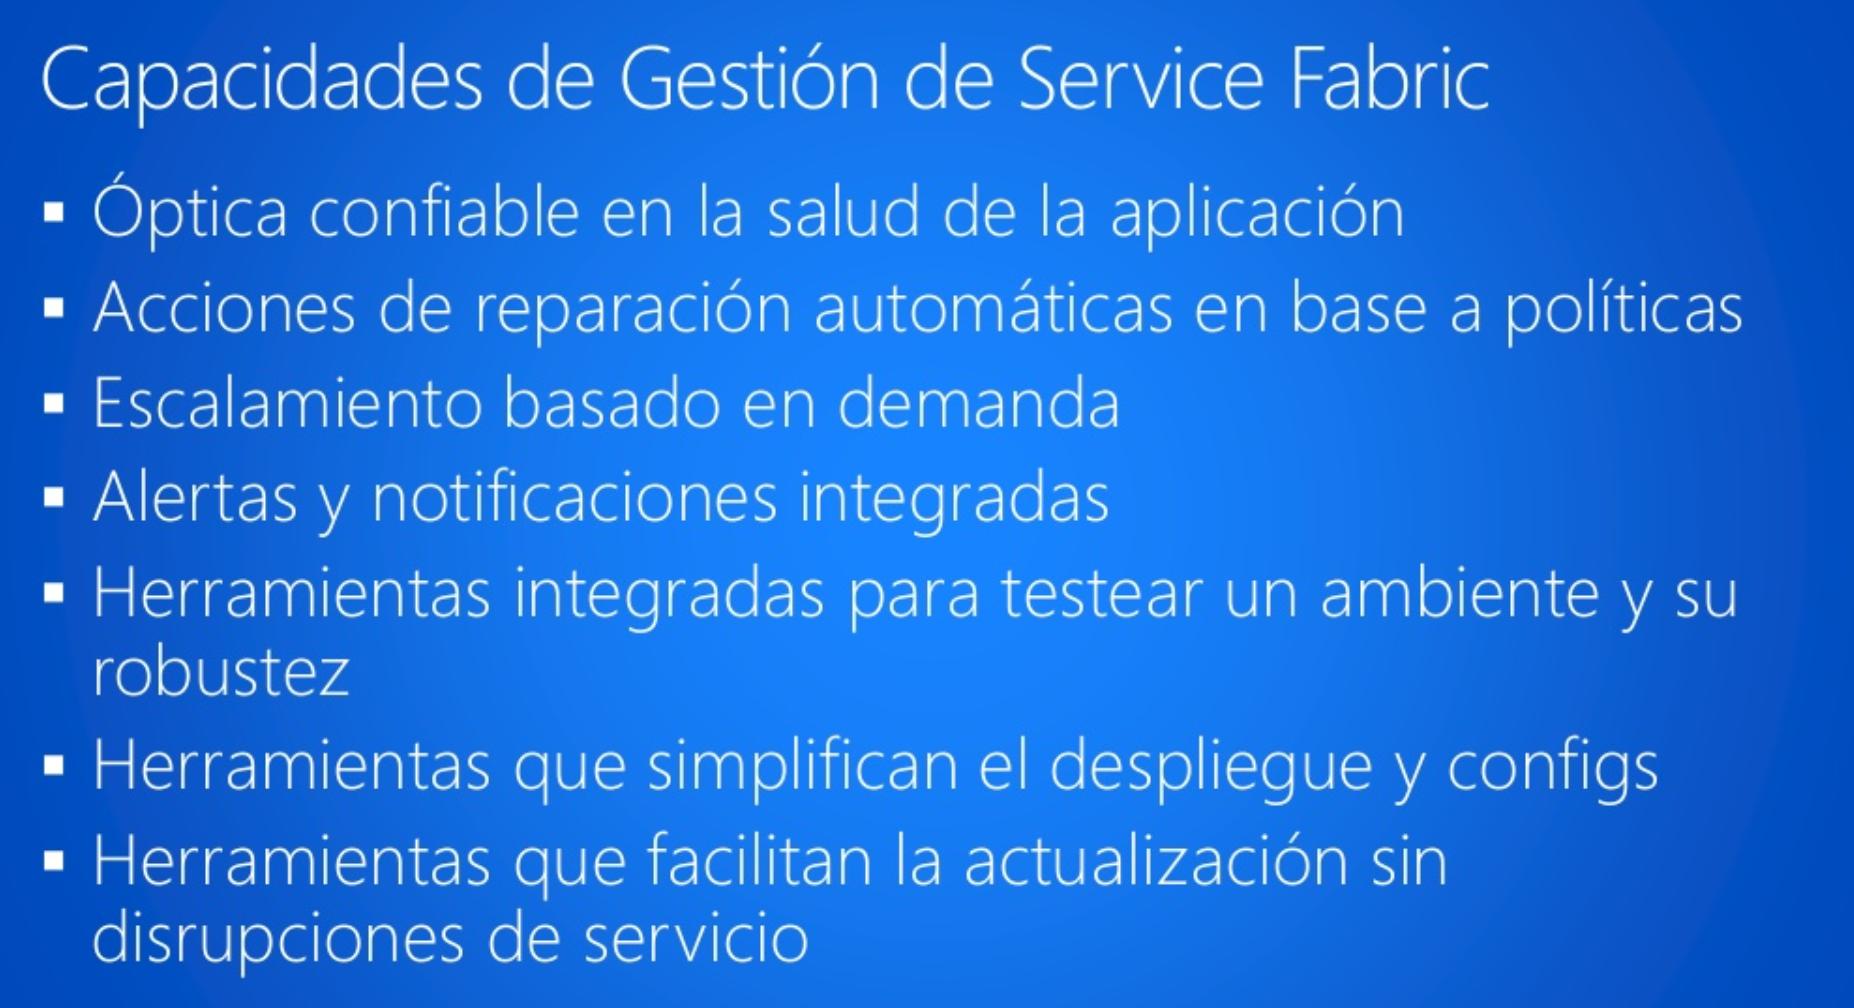 Azure Service Fabric | Capacidades